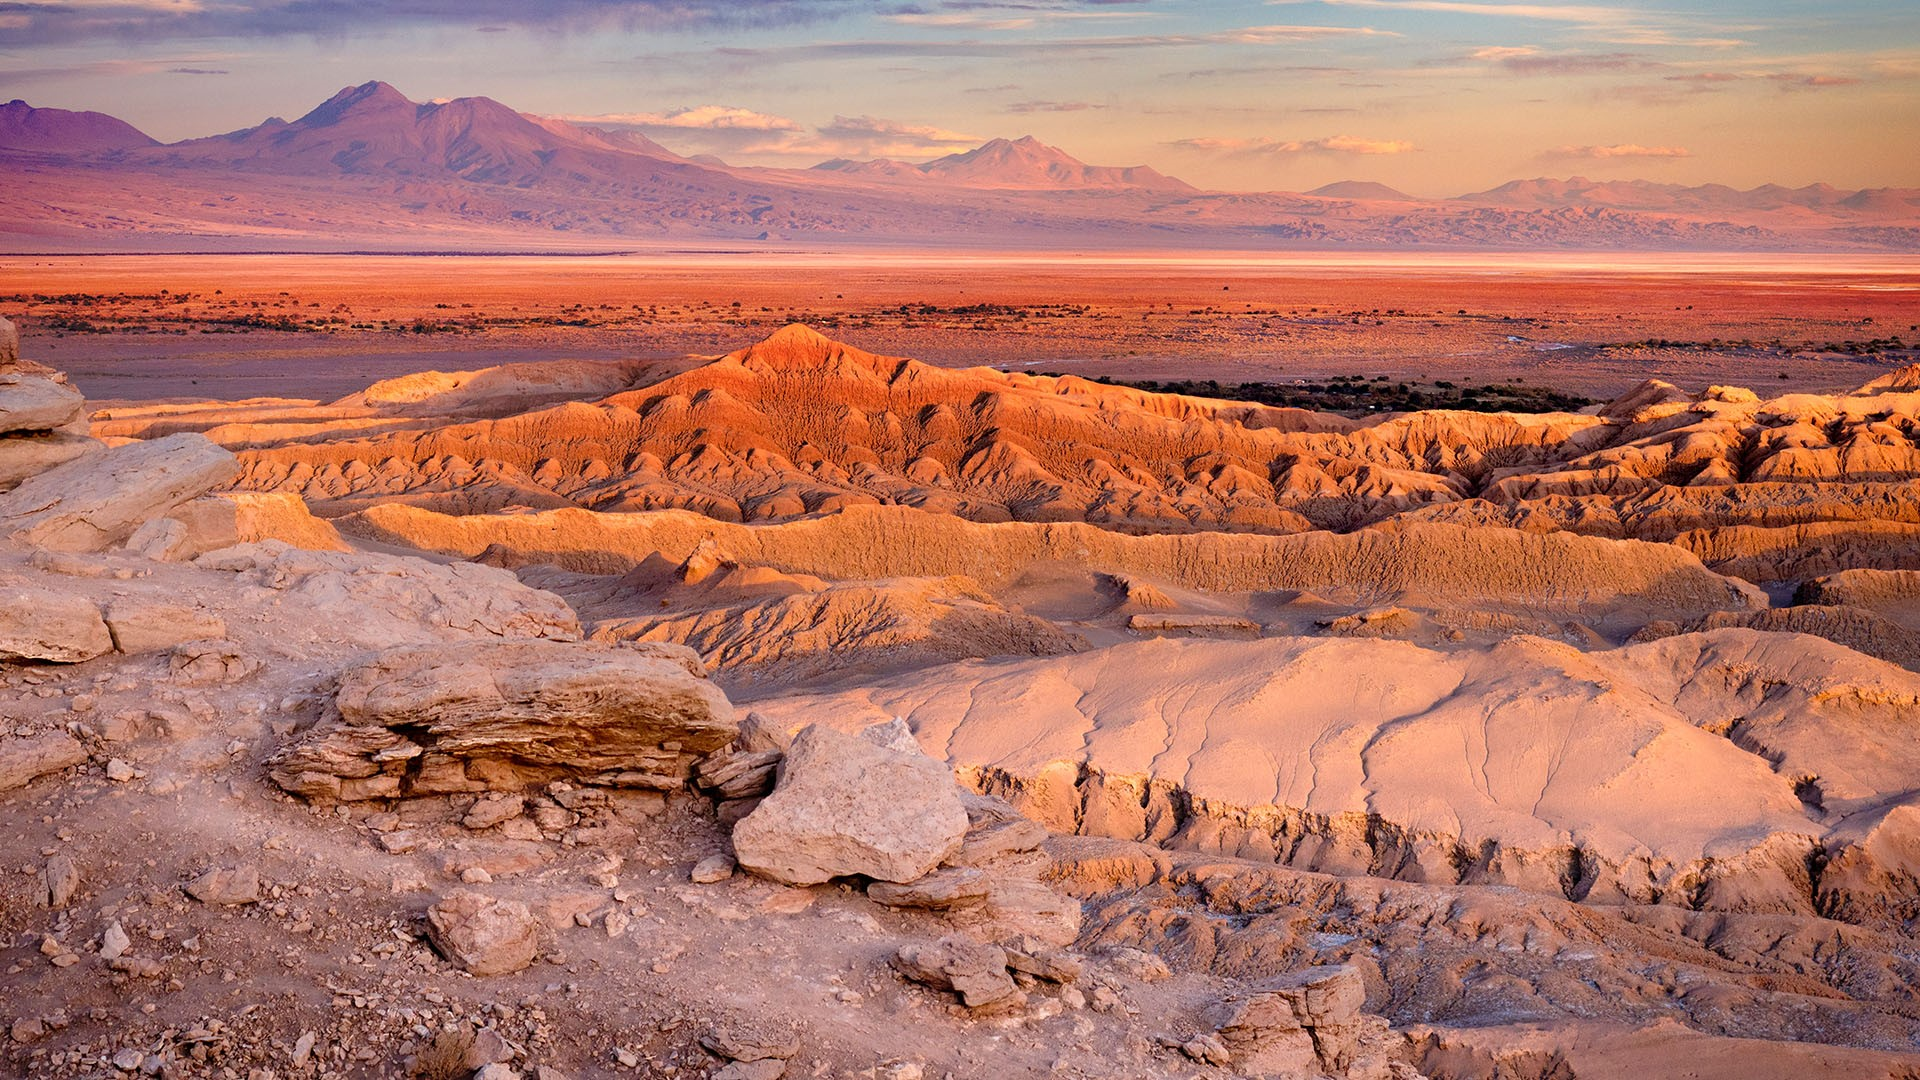 Overview of El Valle de la Luna (Valley of the Moon), Atacama Desert, Chile  | Windows 10 Spotlight Images